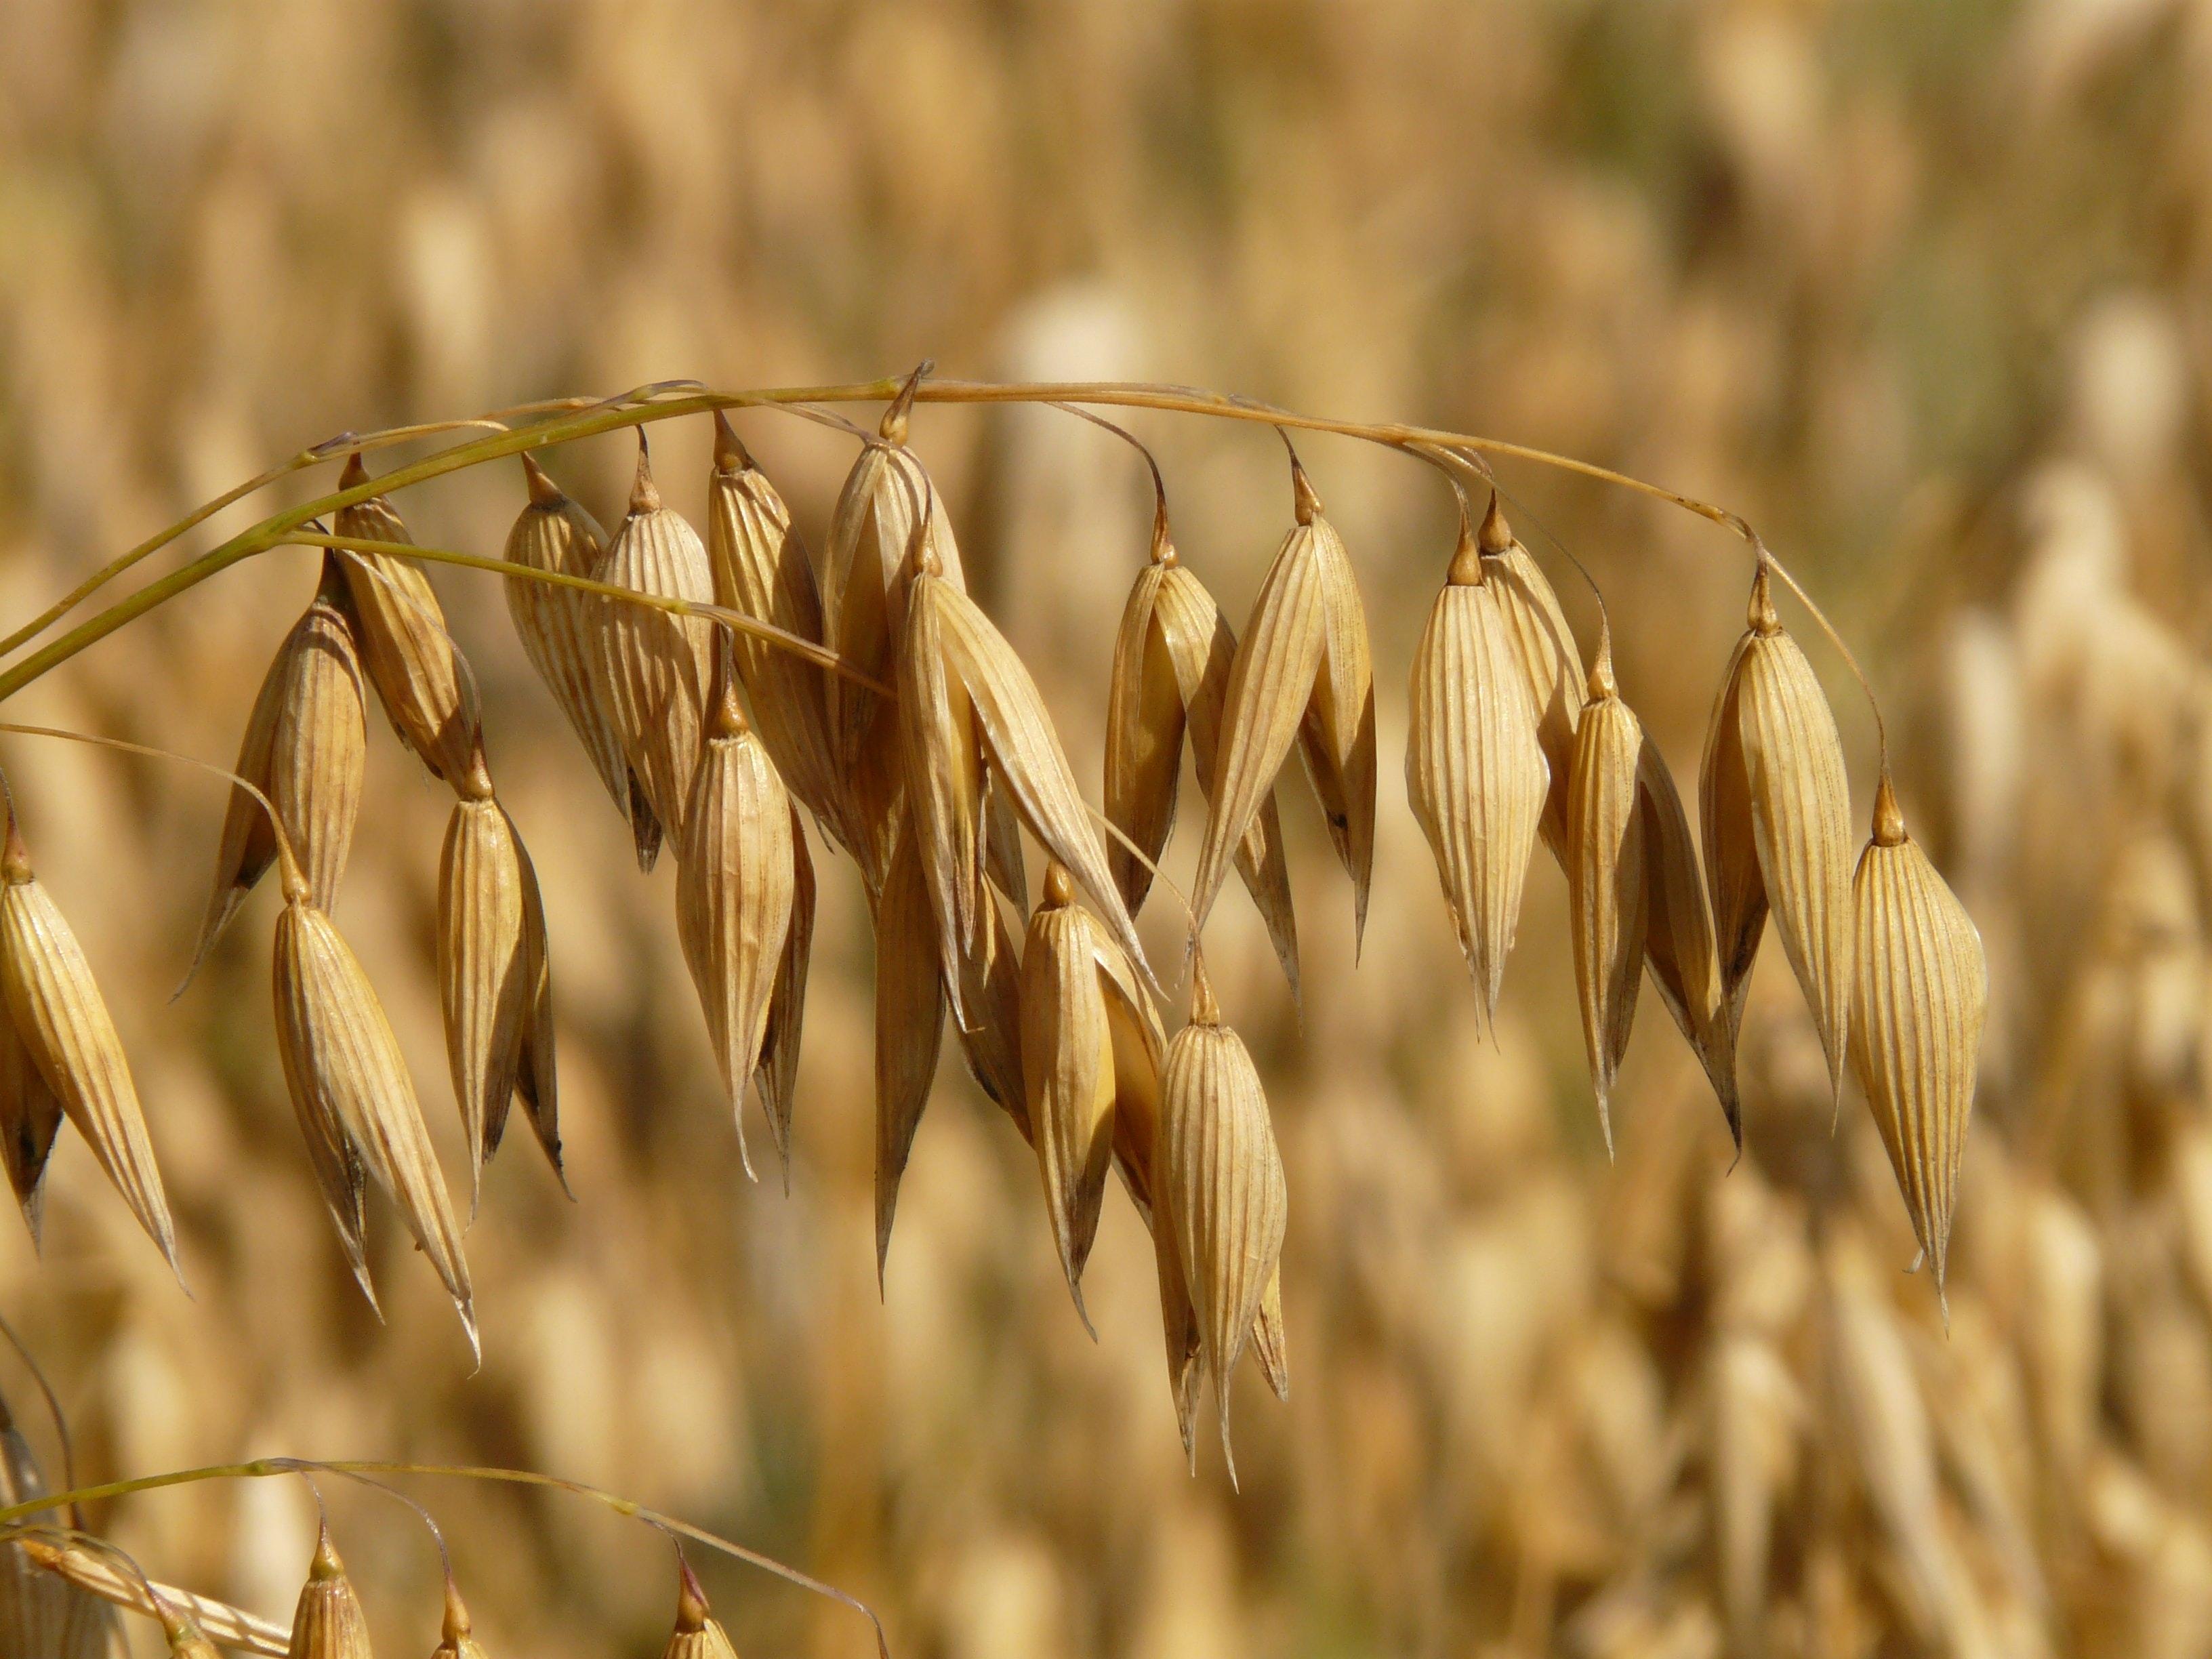 Deer eat grains and oats